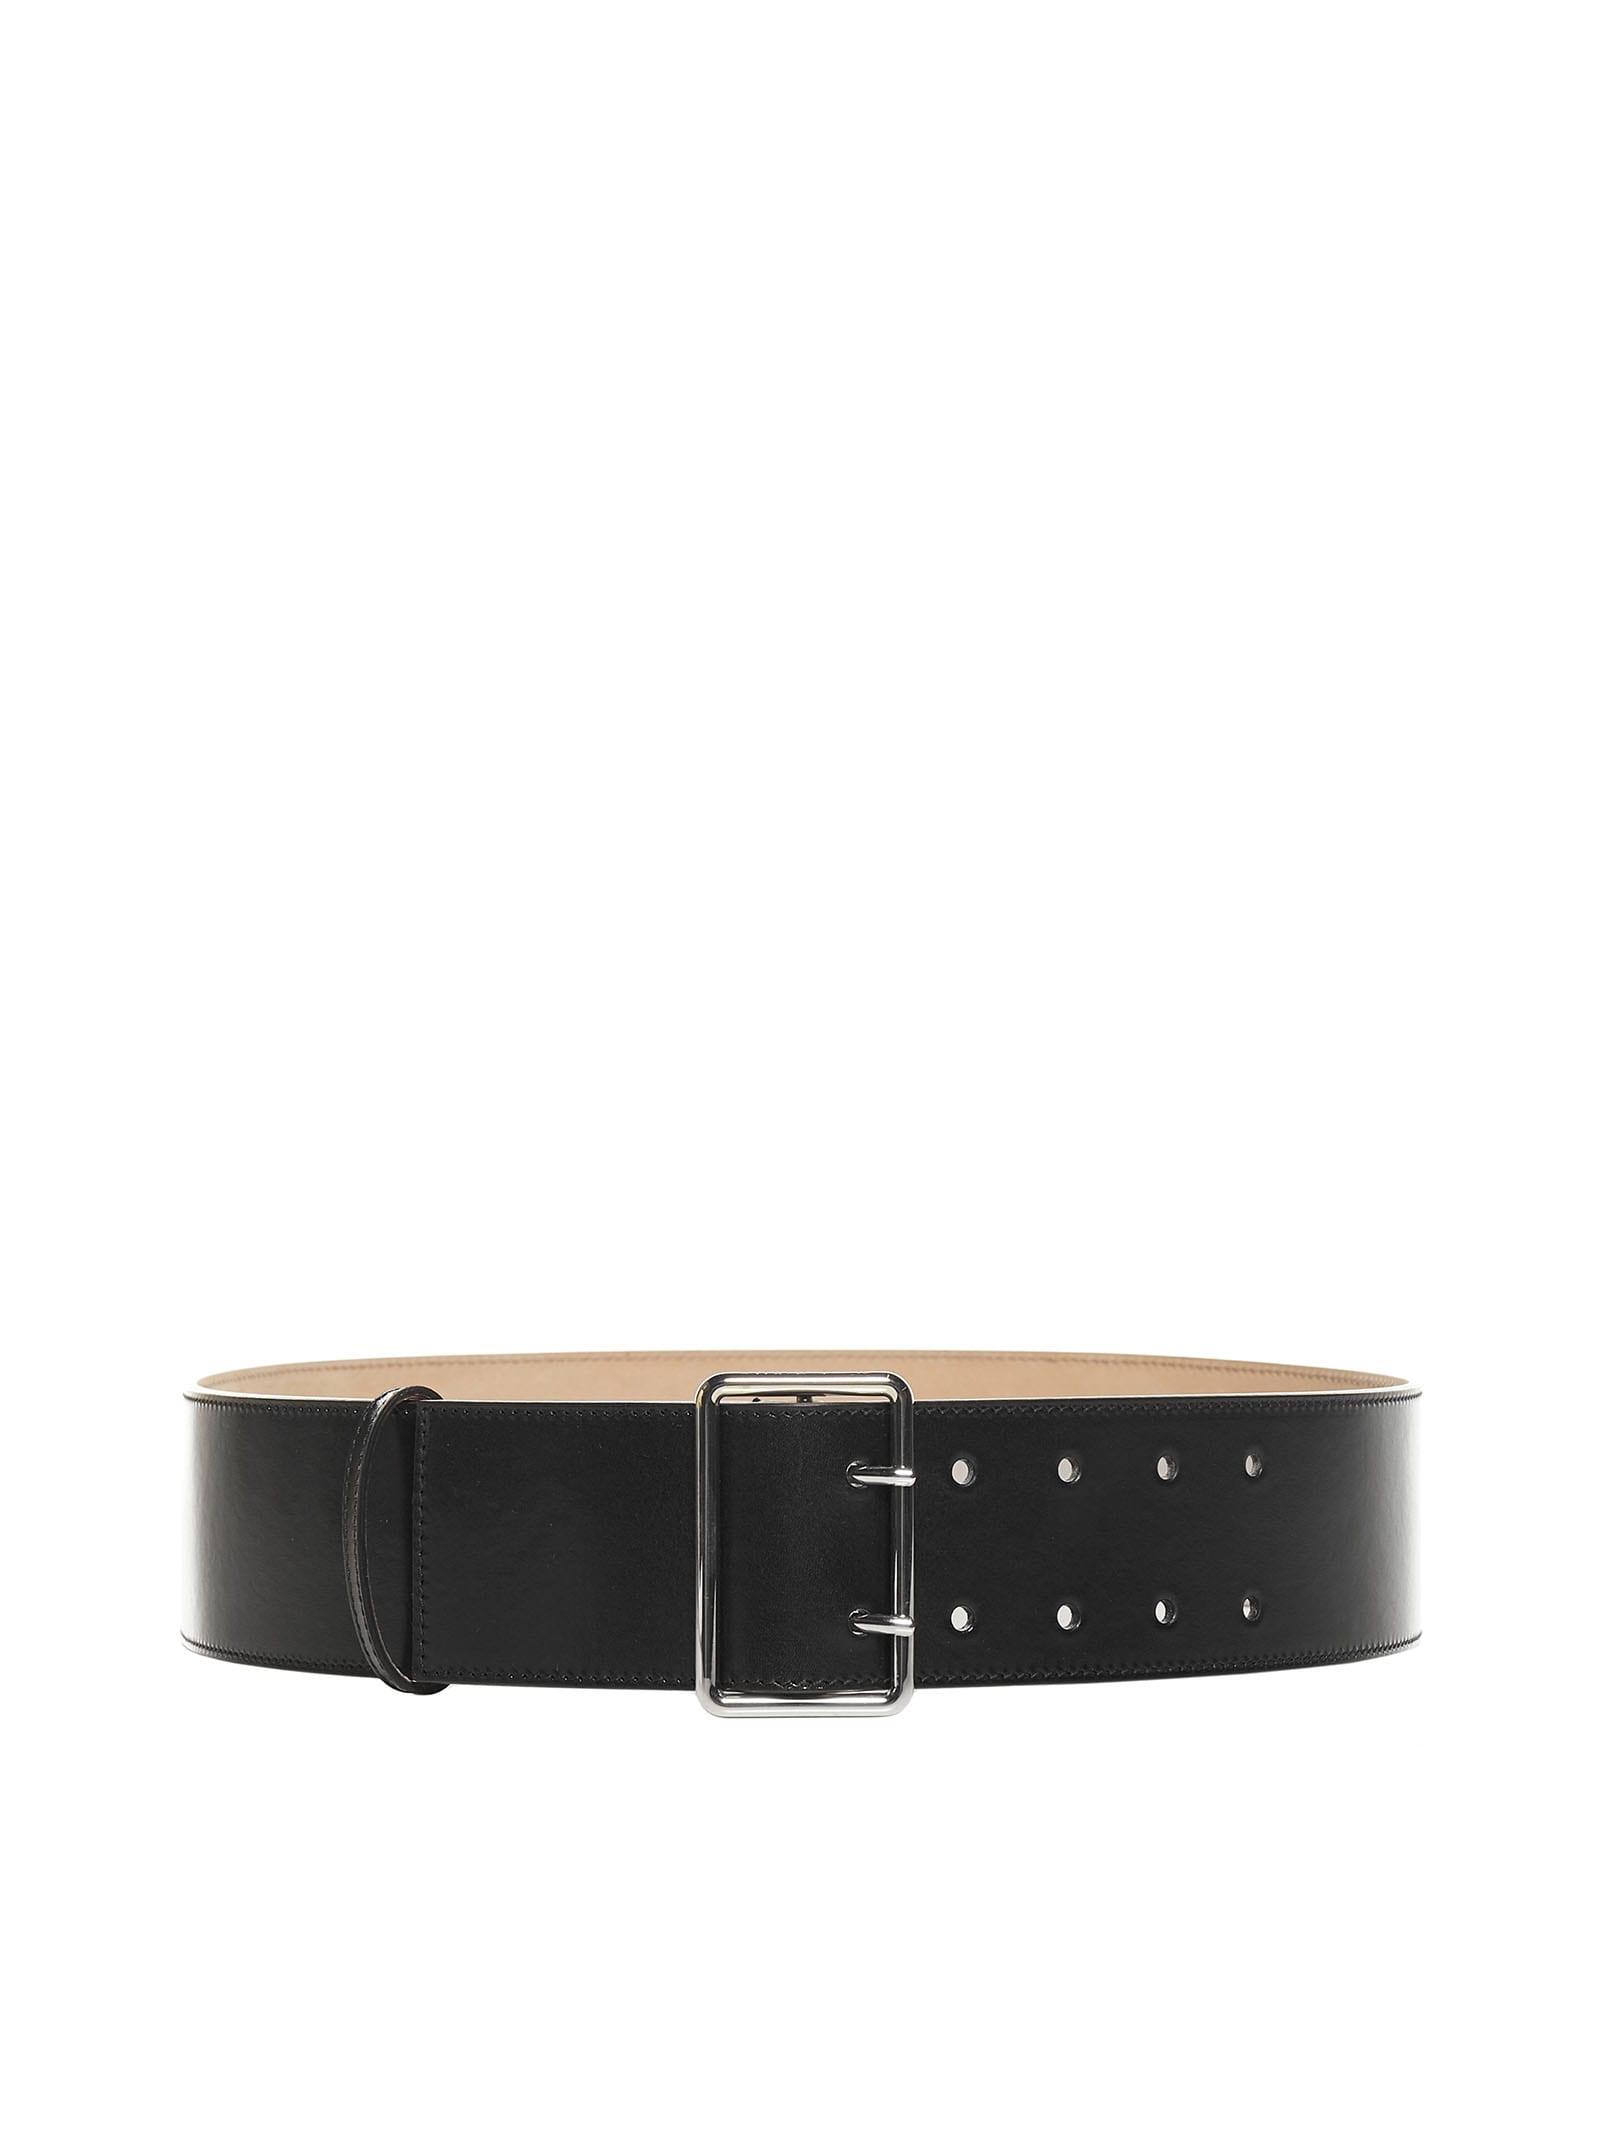 Alexander McQueen Military Leather Belt